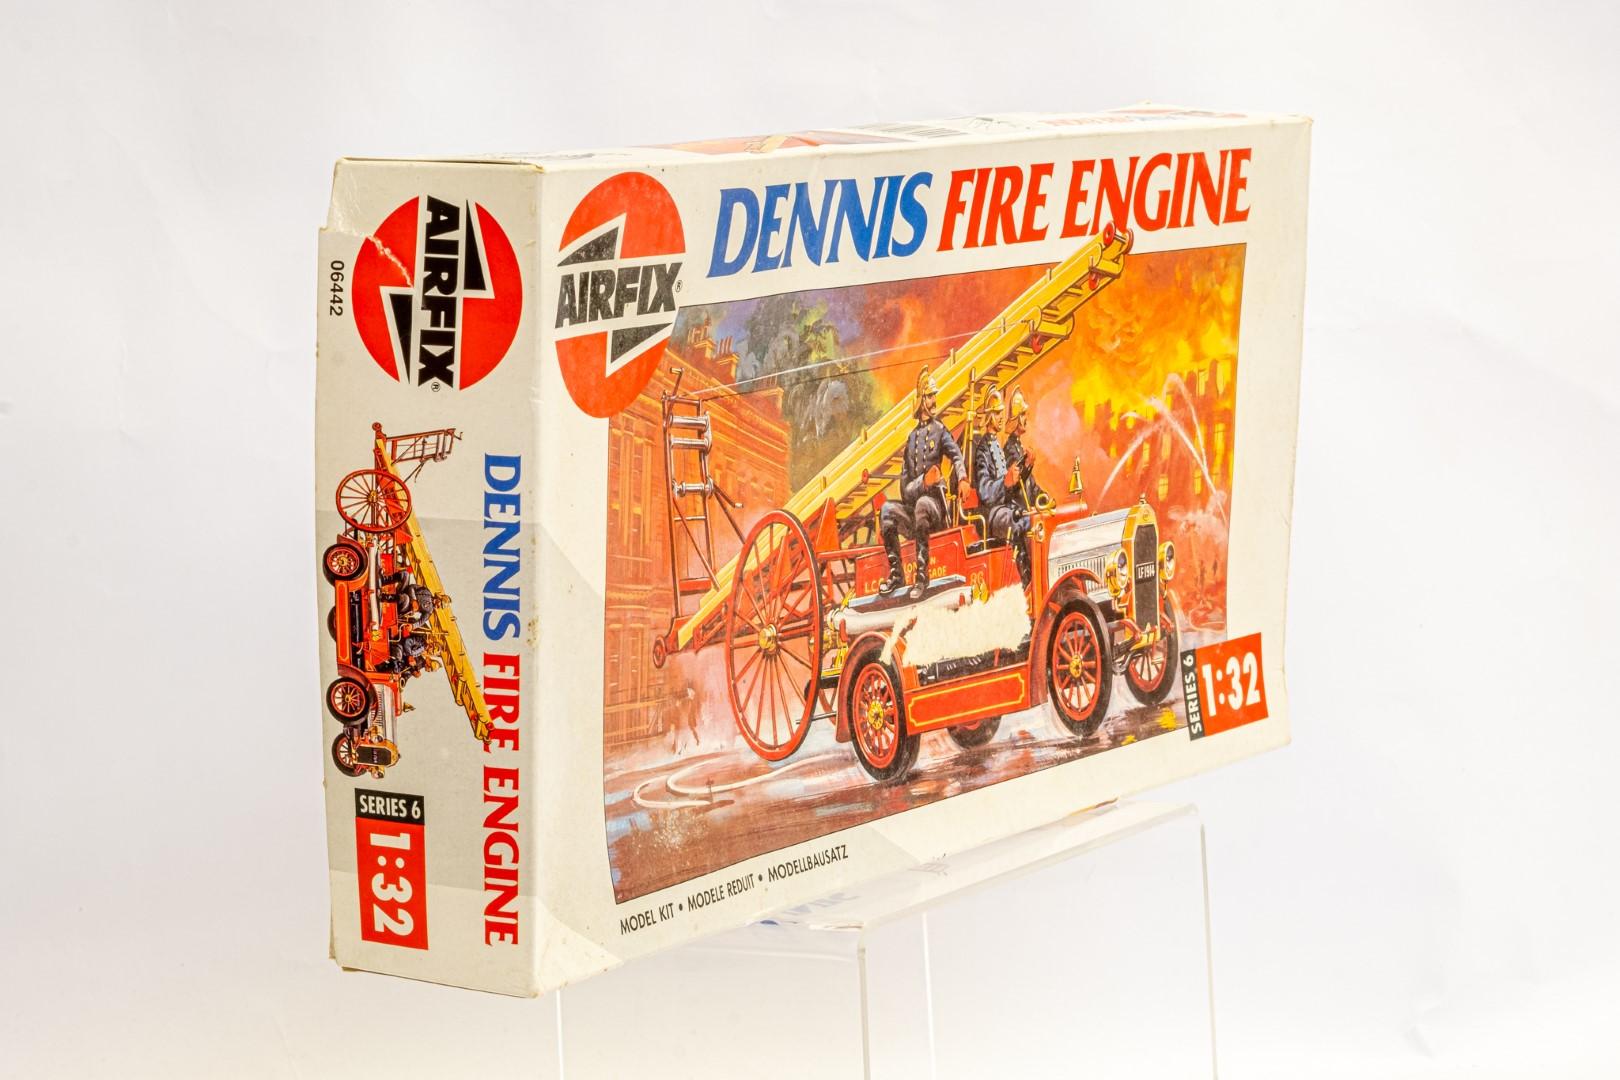 Airfix Dennis Fire Engine - Image 2 of 4